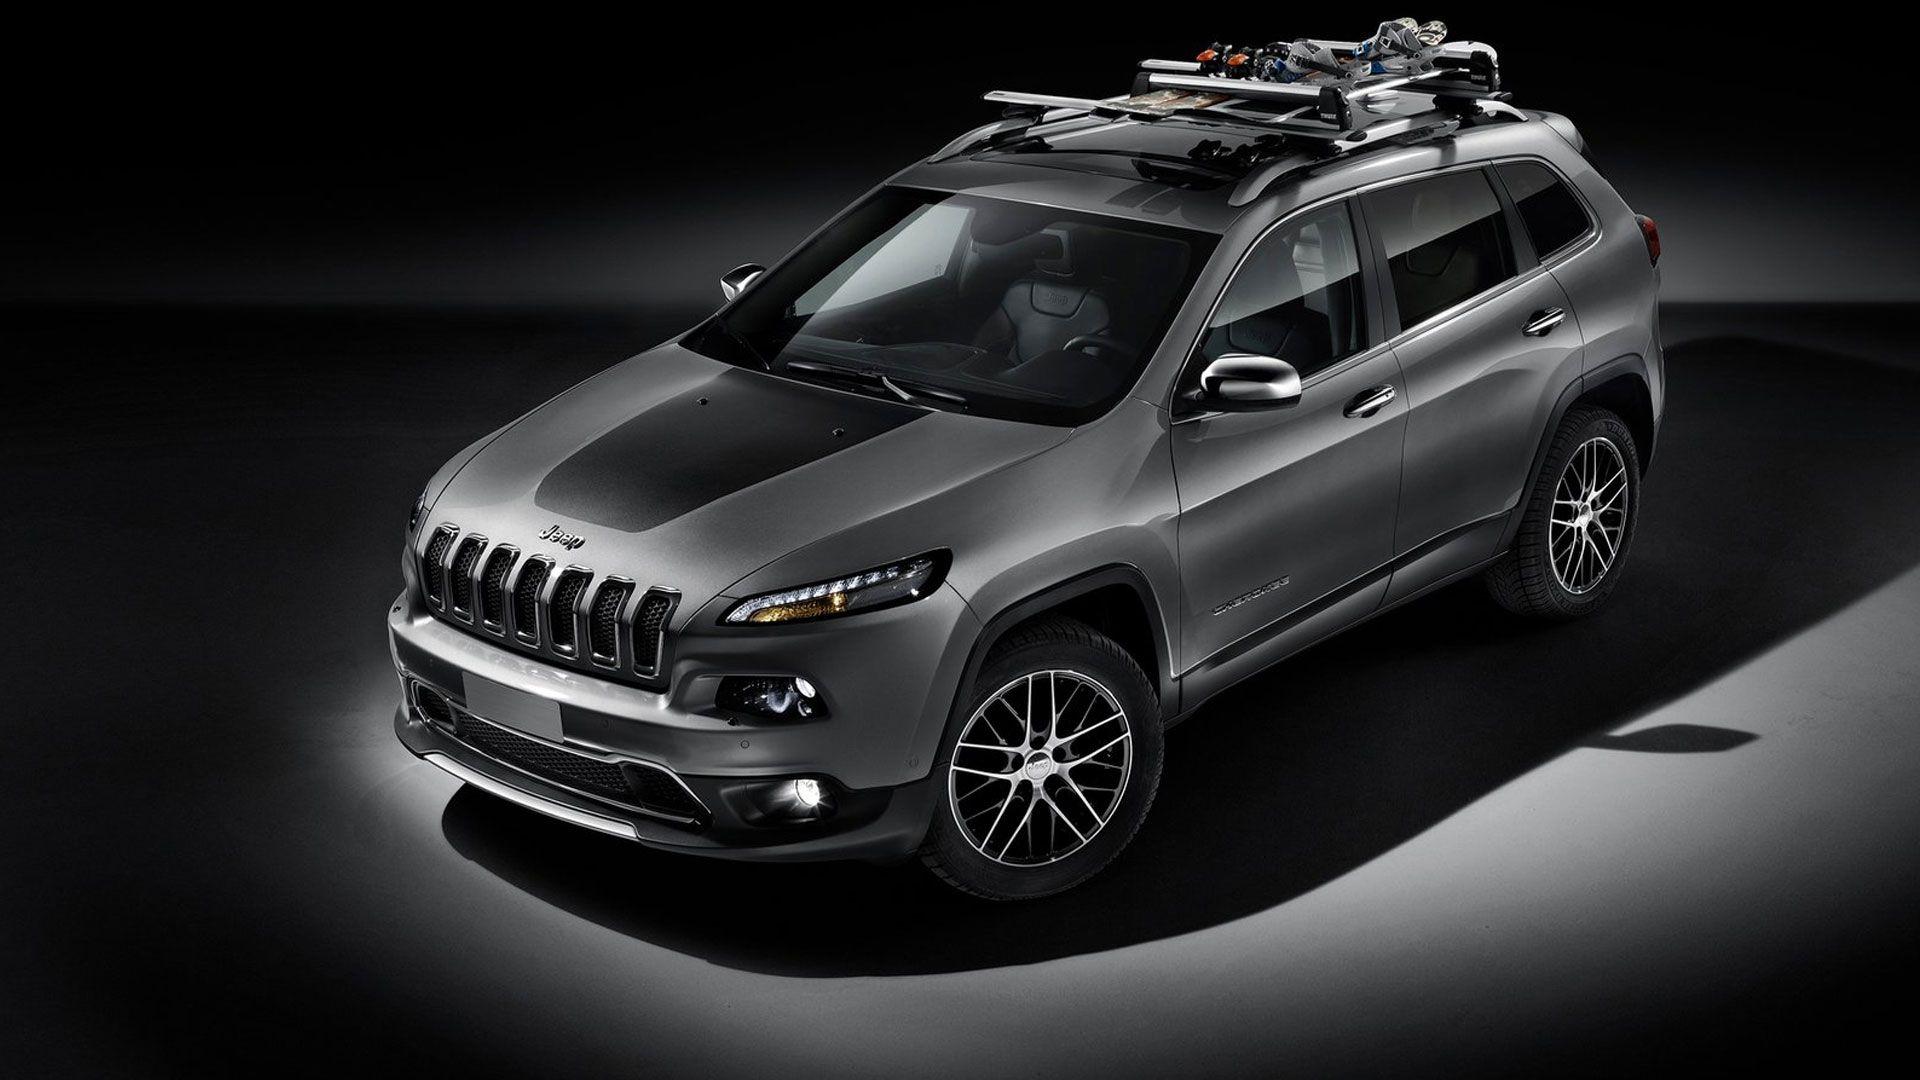 jeep cherokee sport 2014 2014 Jeep Cherokee EU Version